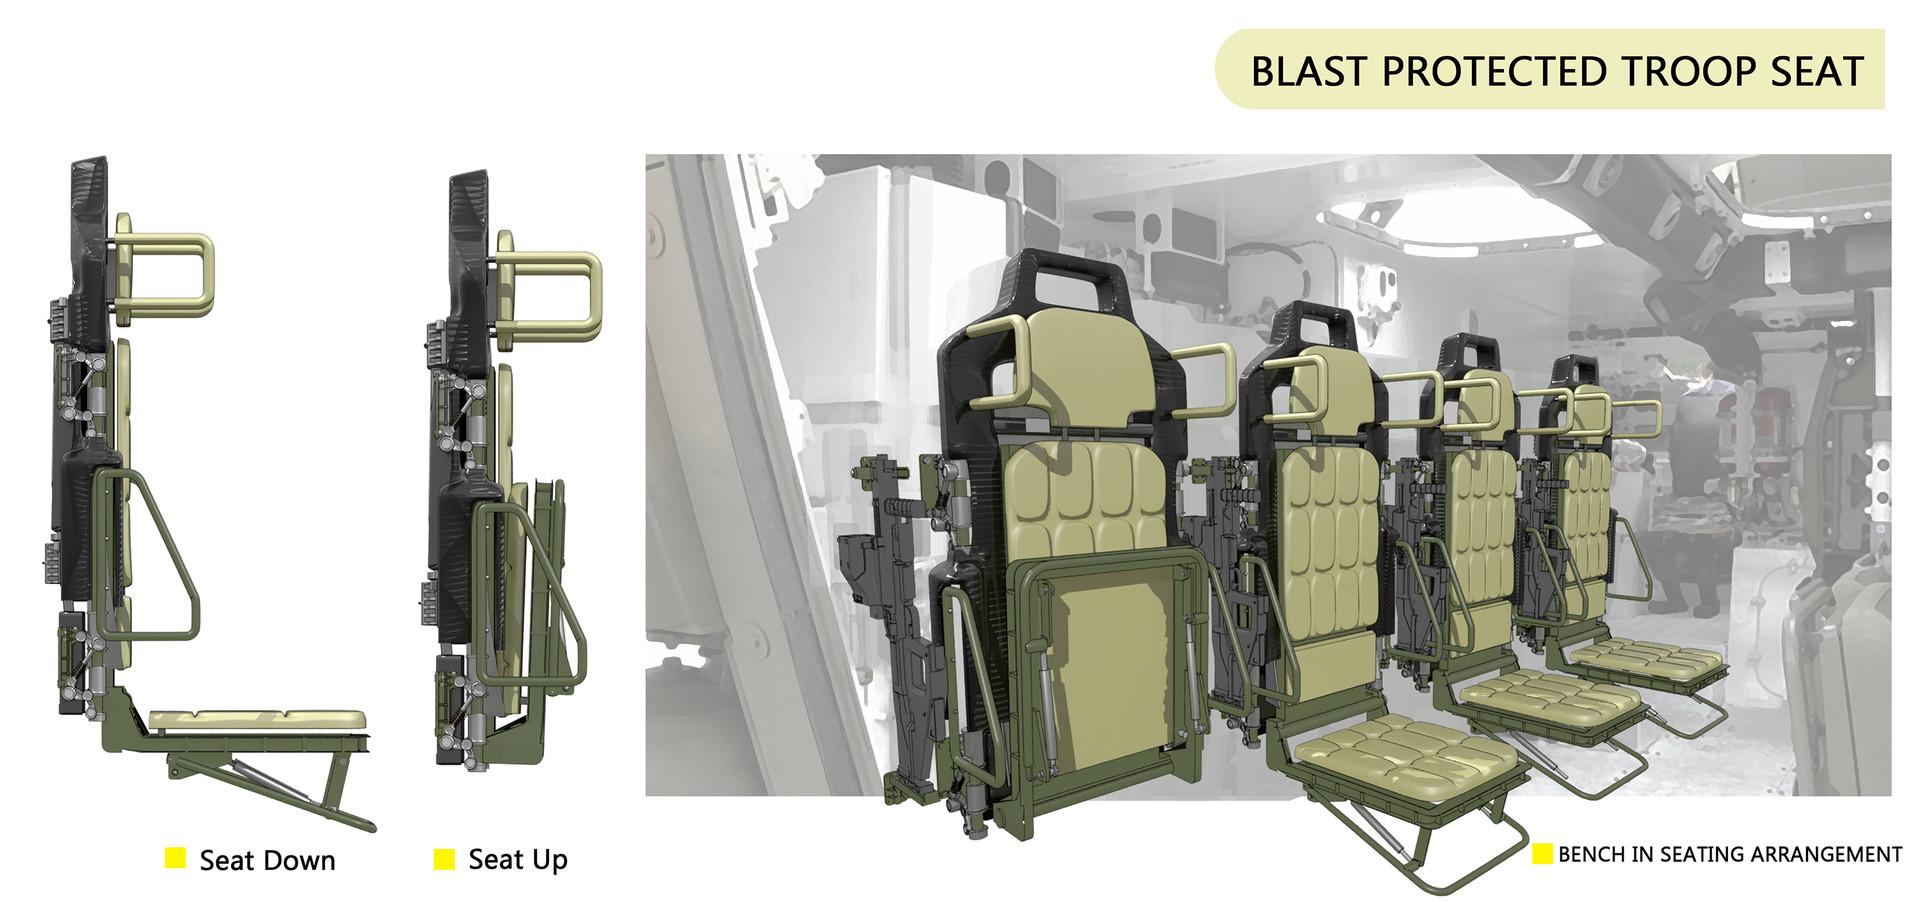 Chen liang troop seat b